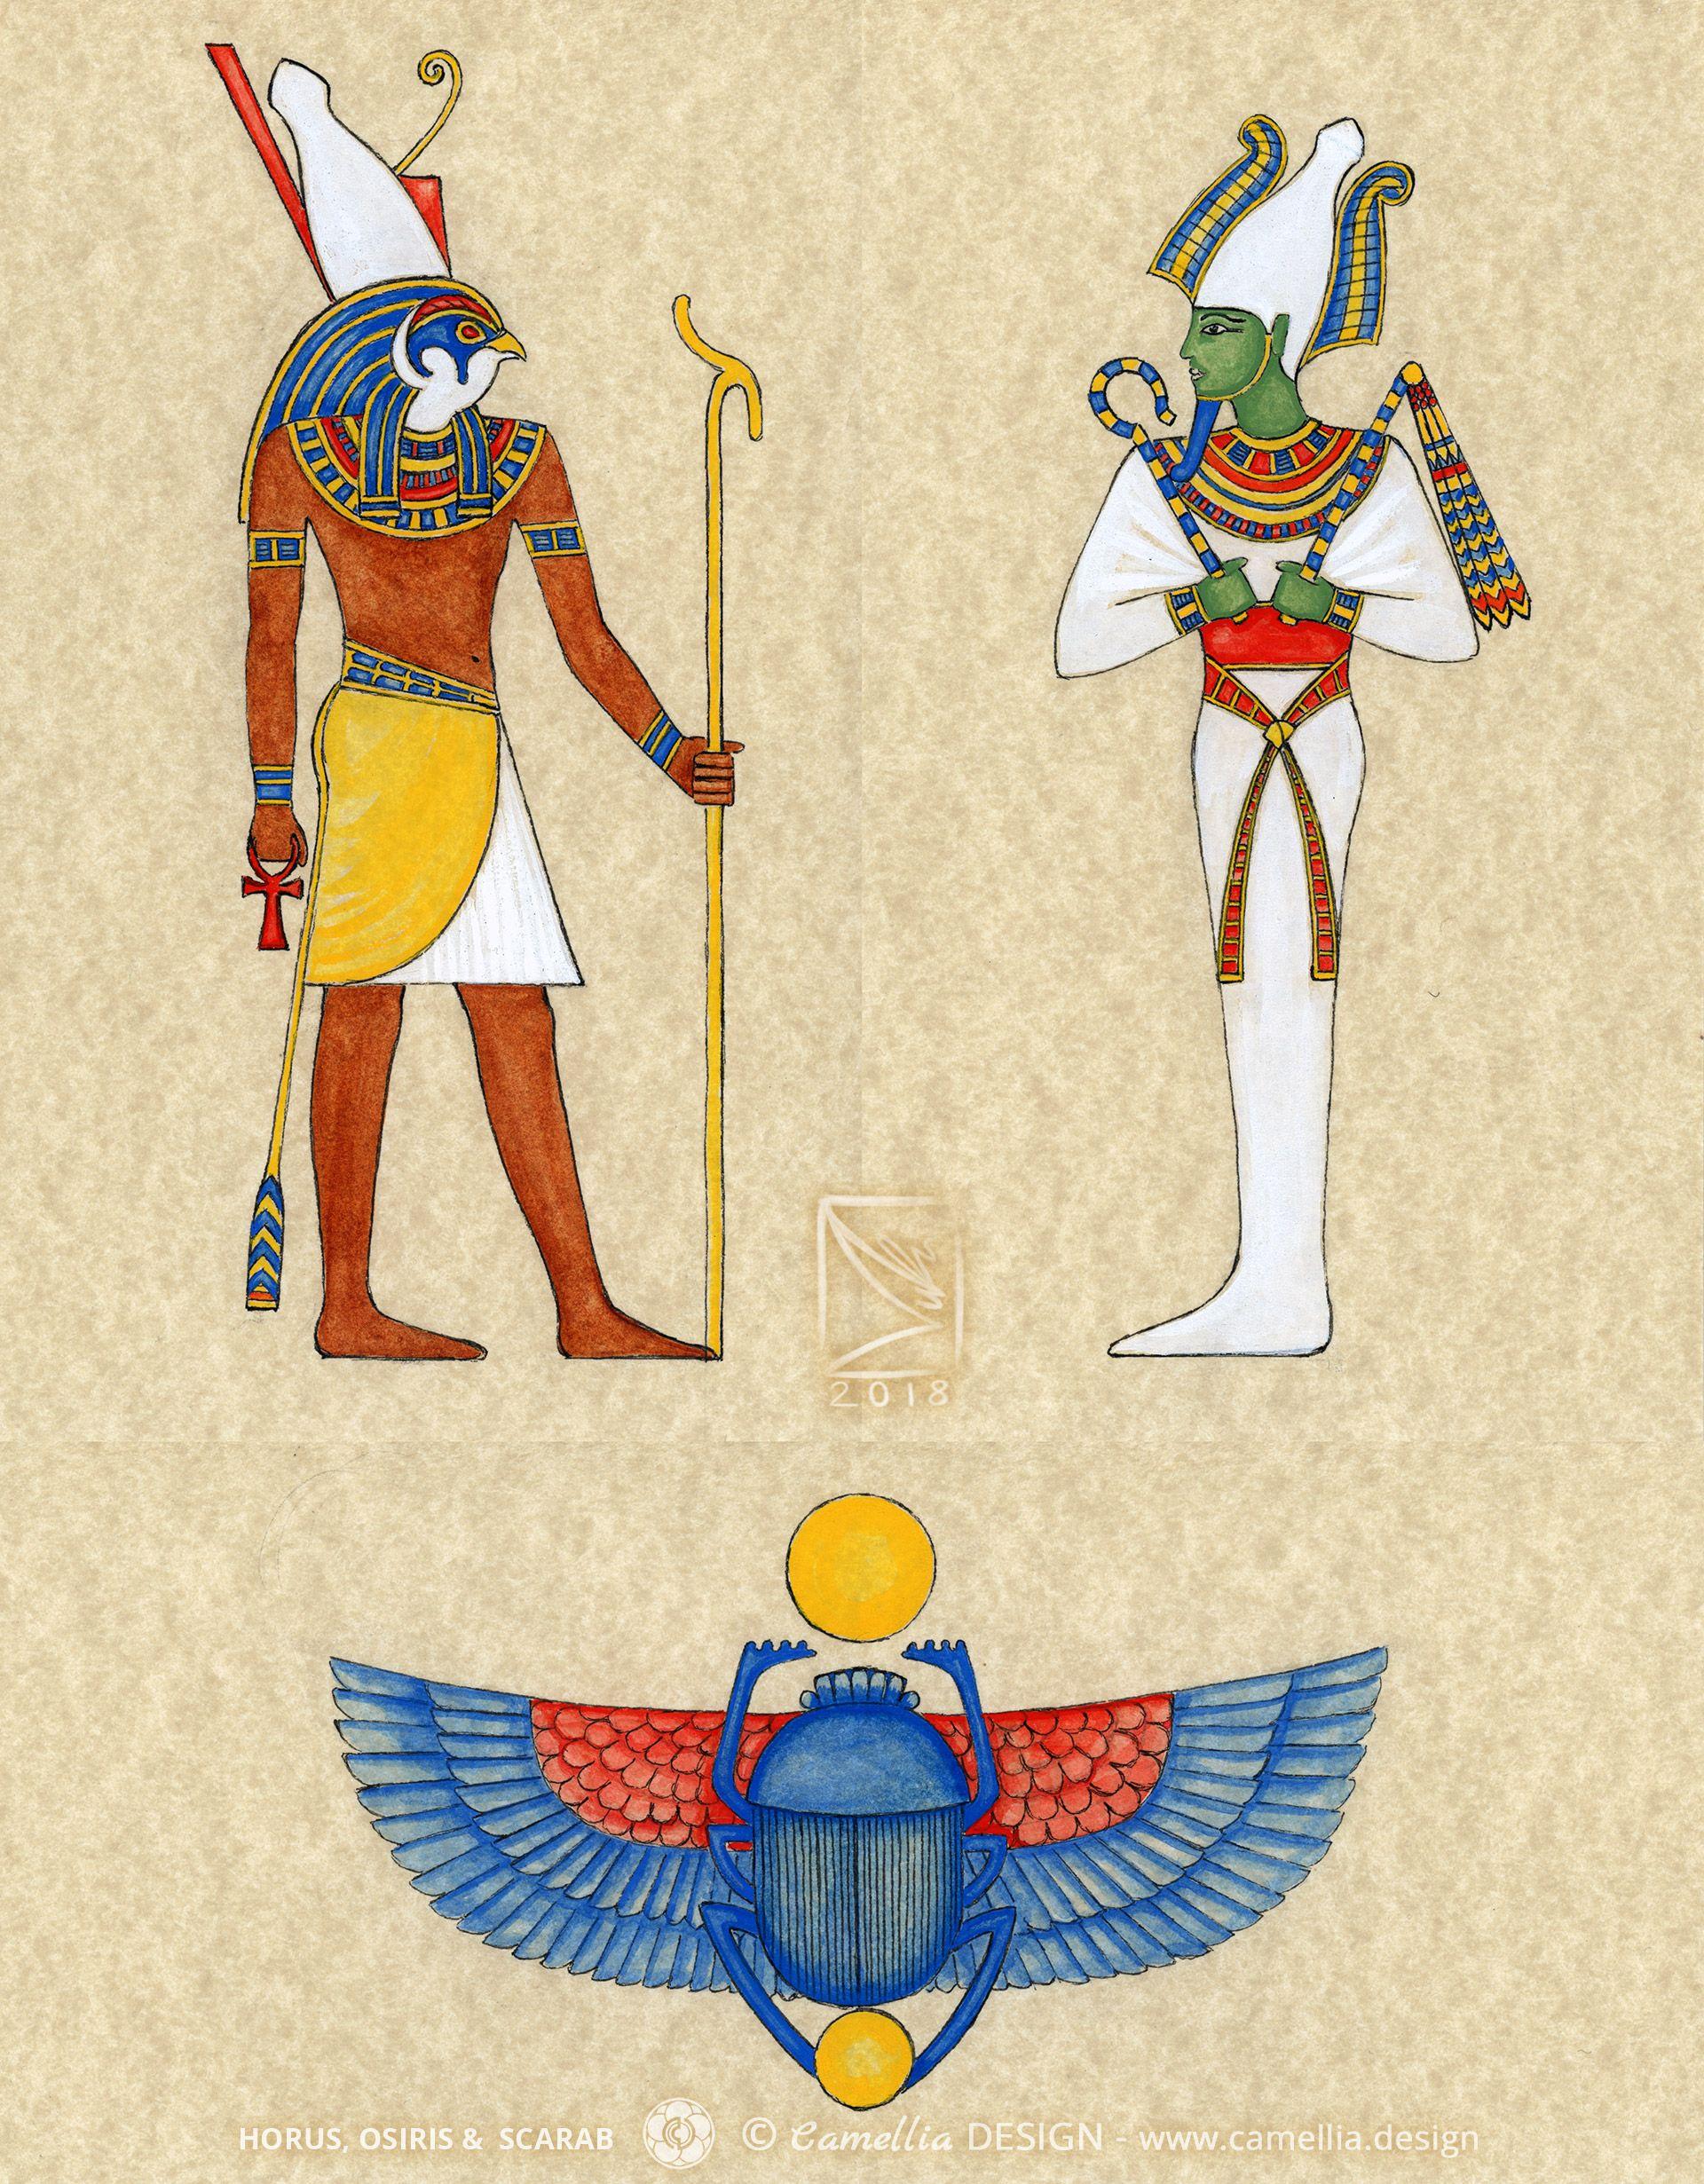 HORUS OSIRIS & SCARAB